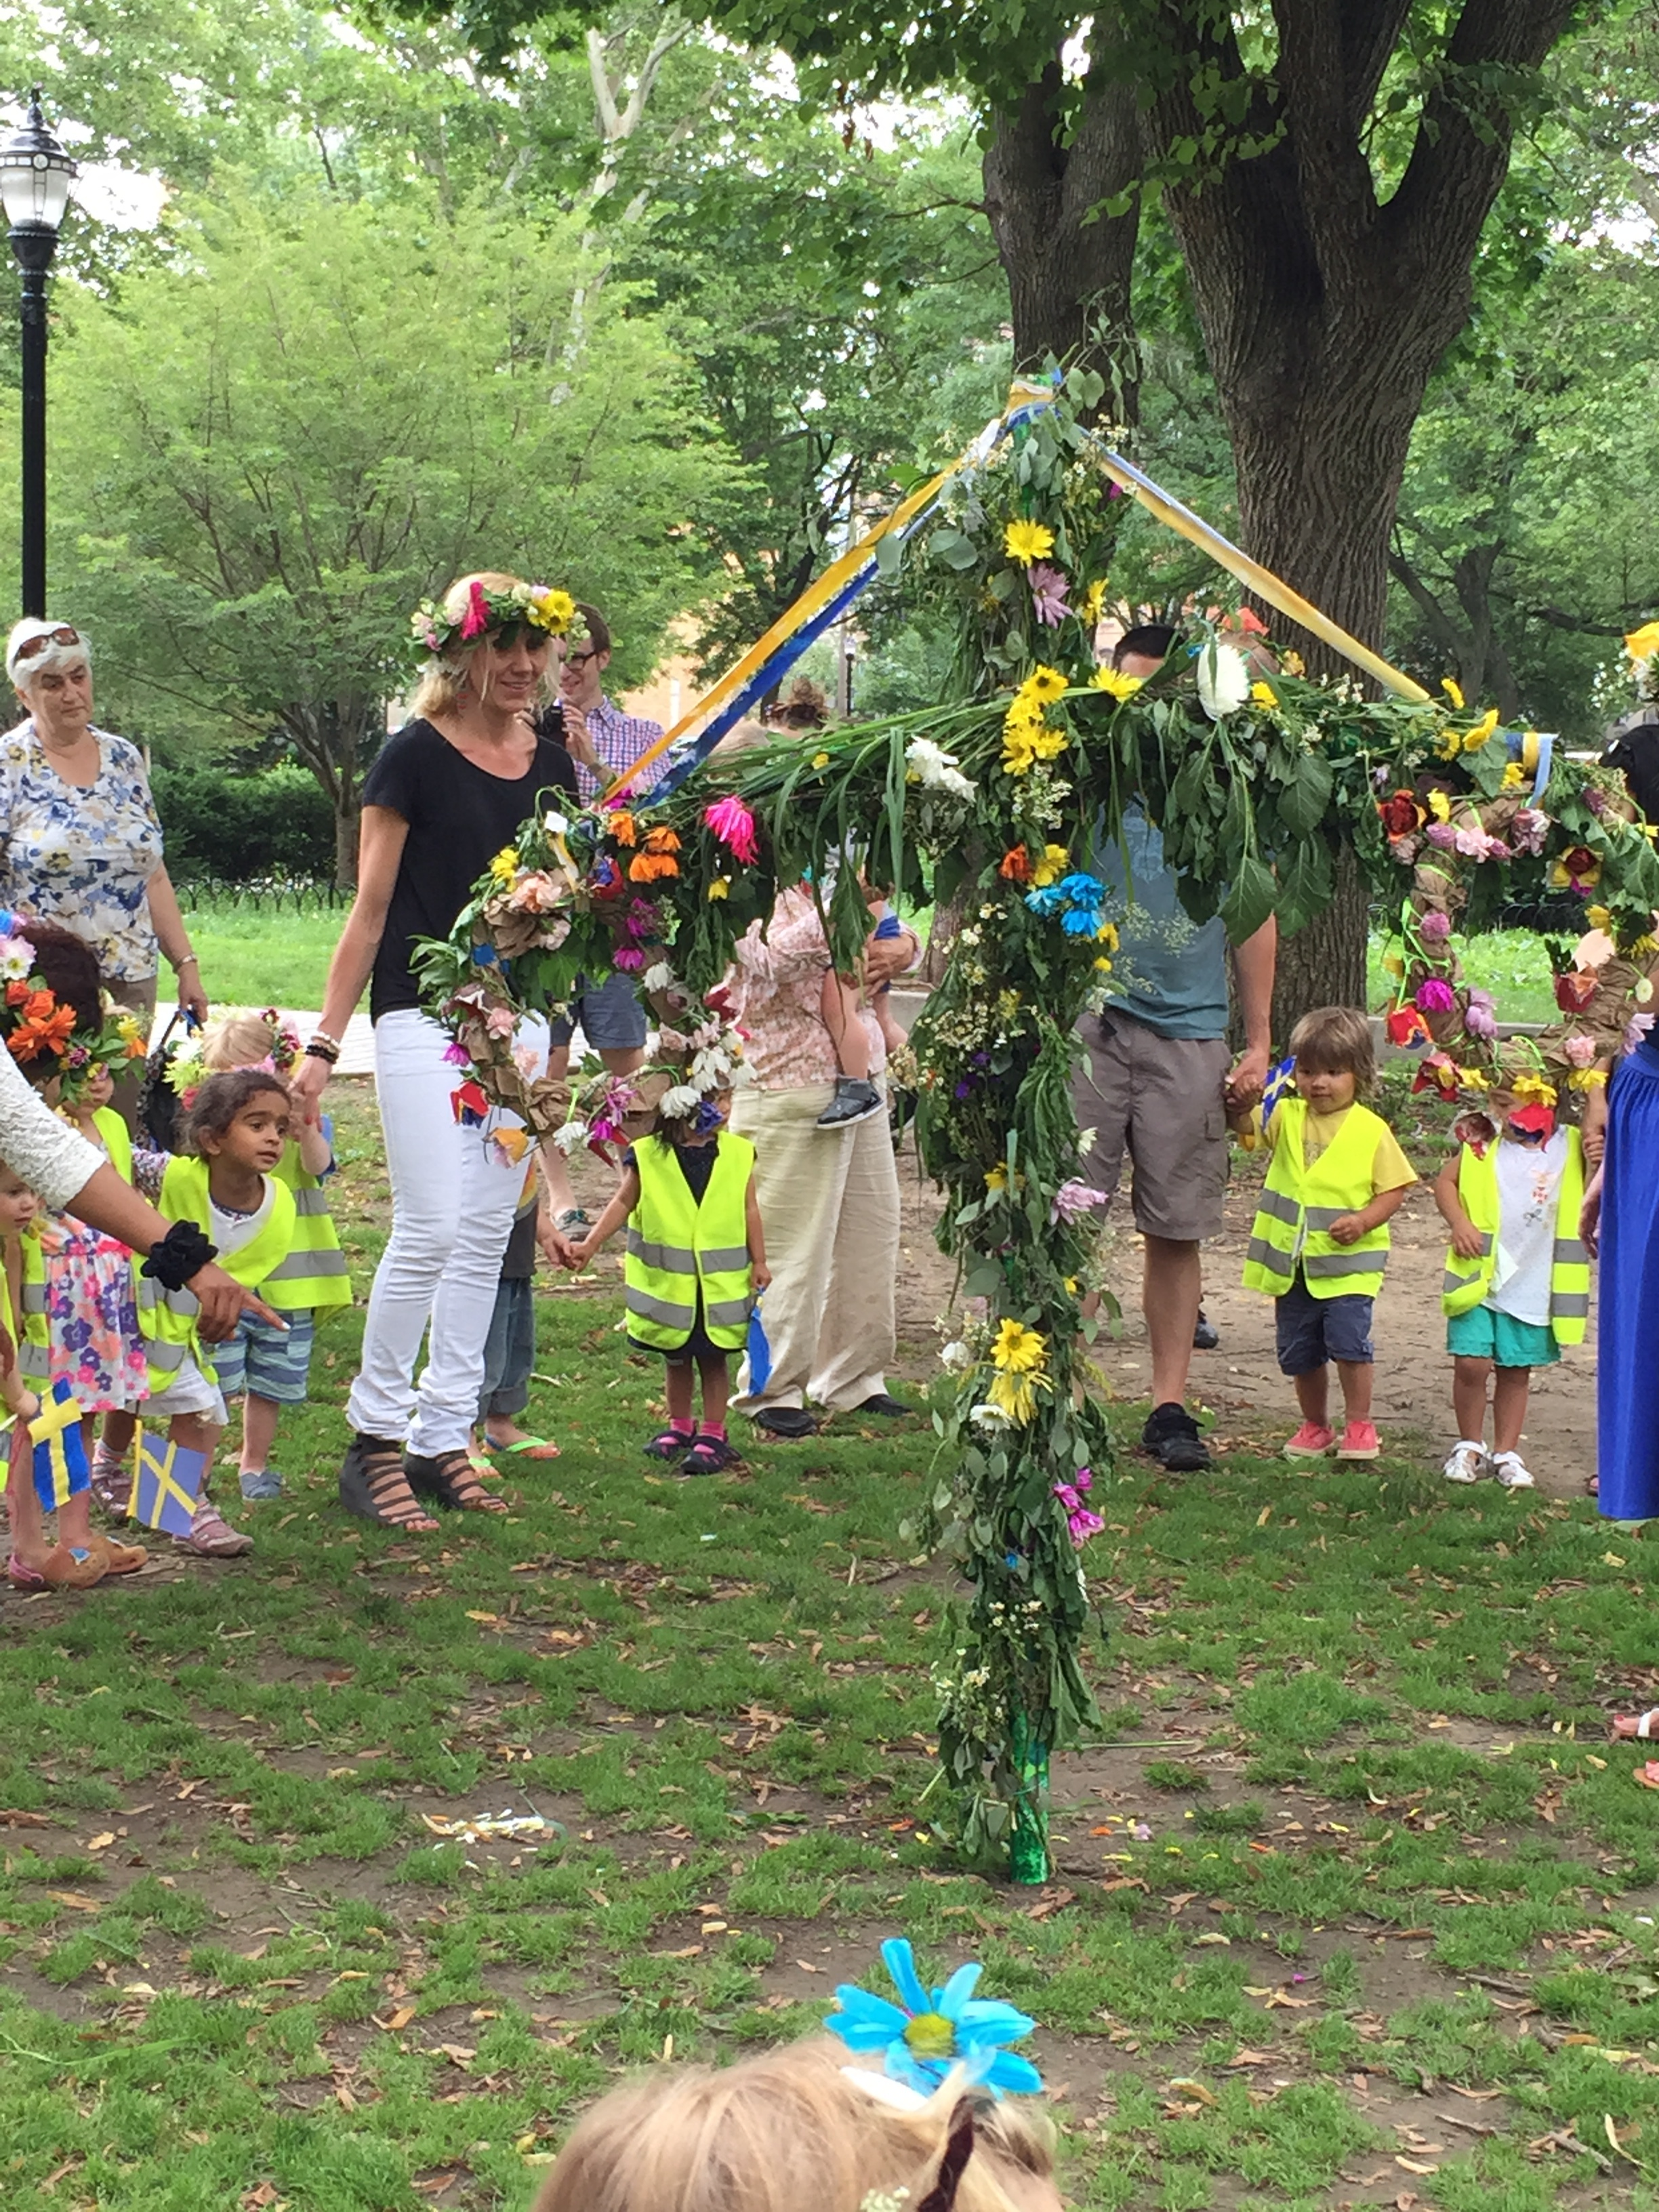 Annual Scandinavian Midsummer Celebration in Hamilton Park